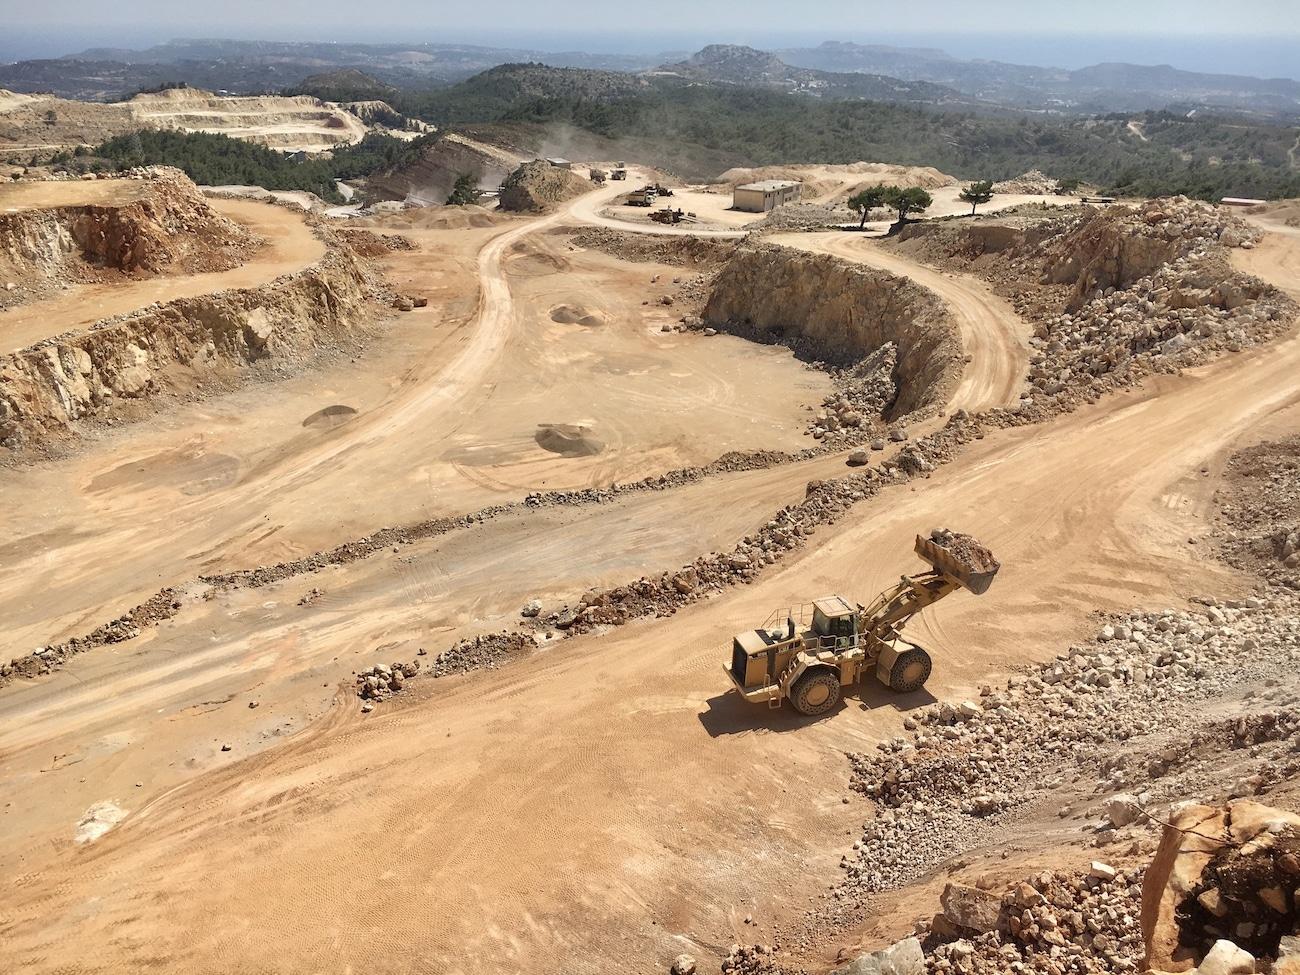 panoramic-quarry-with-a-buldozer